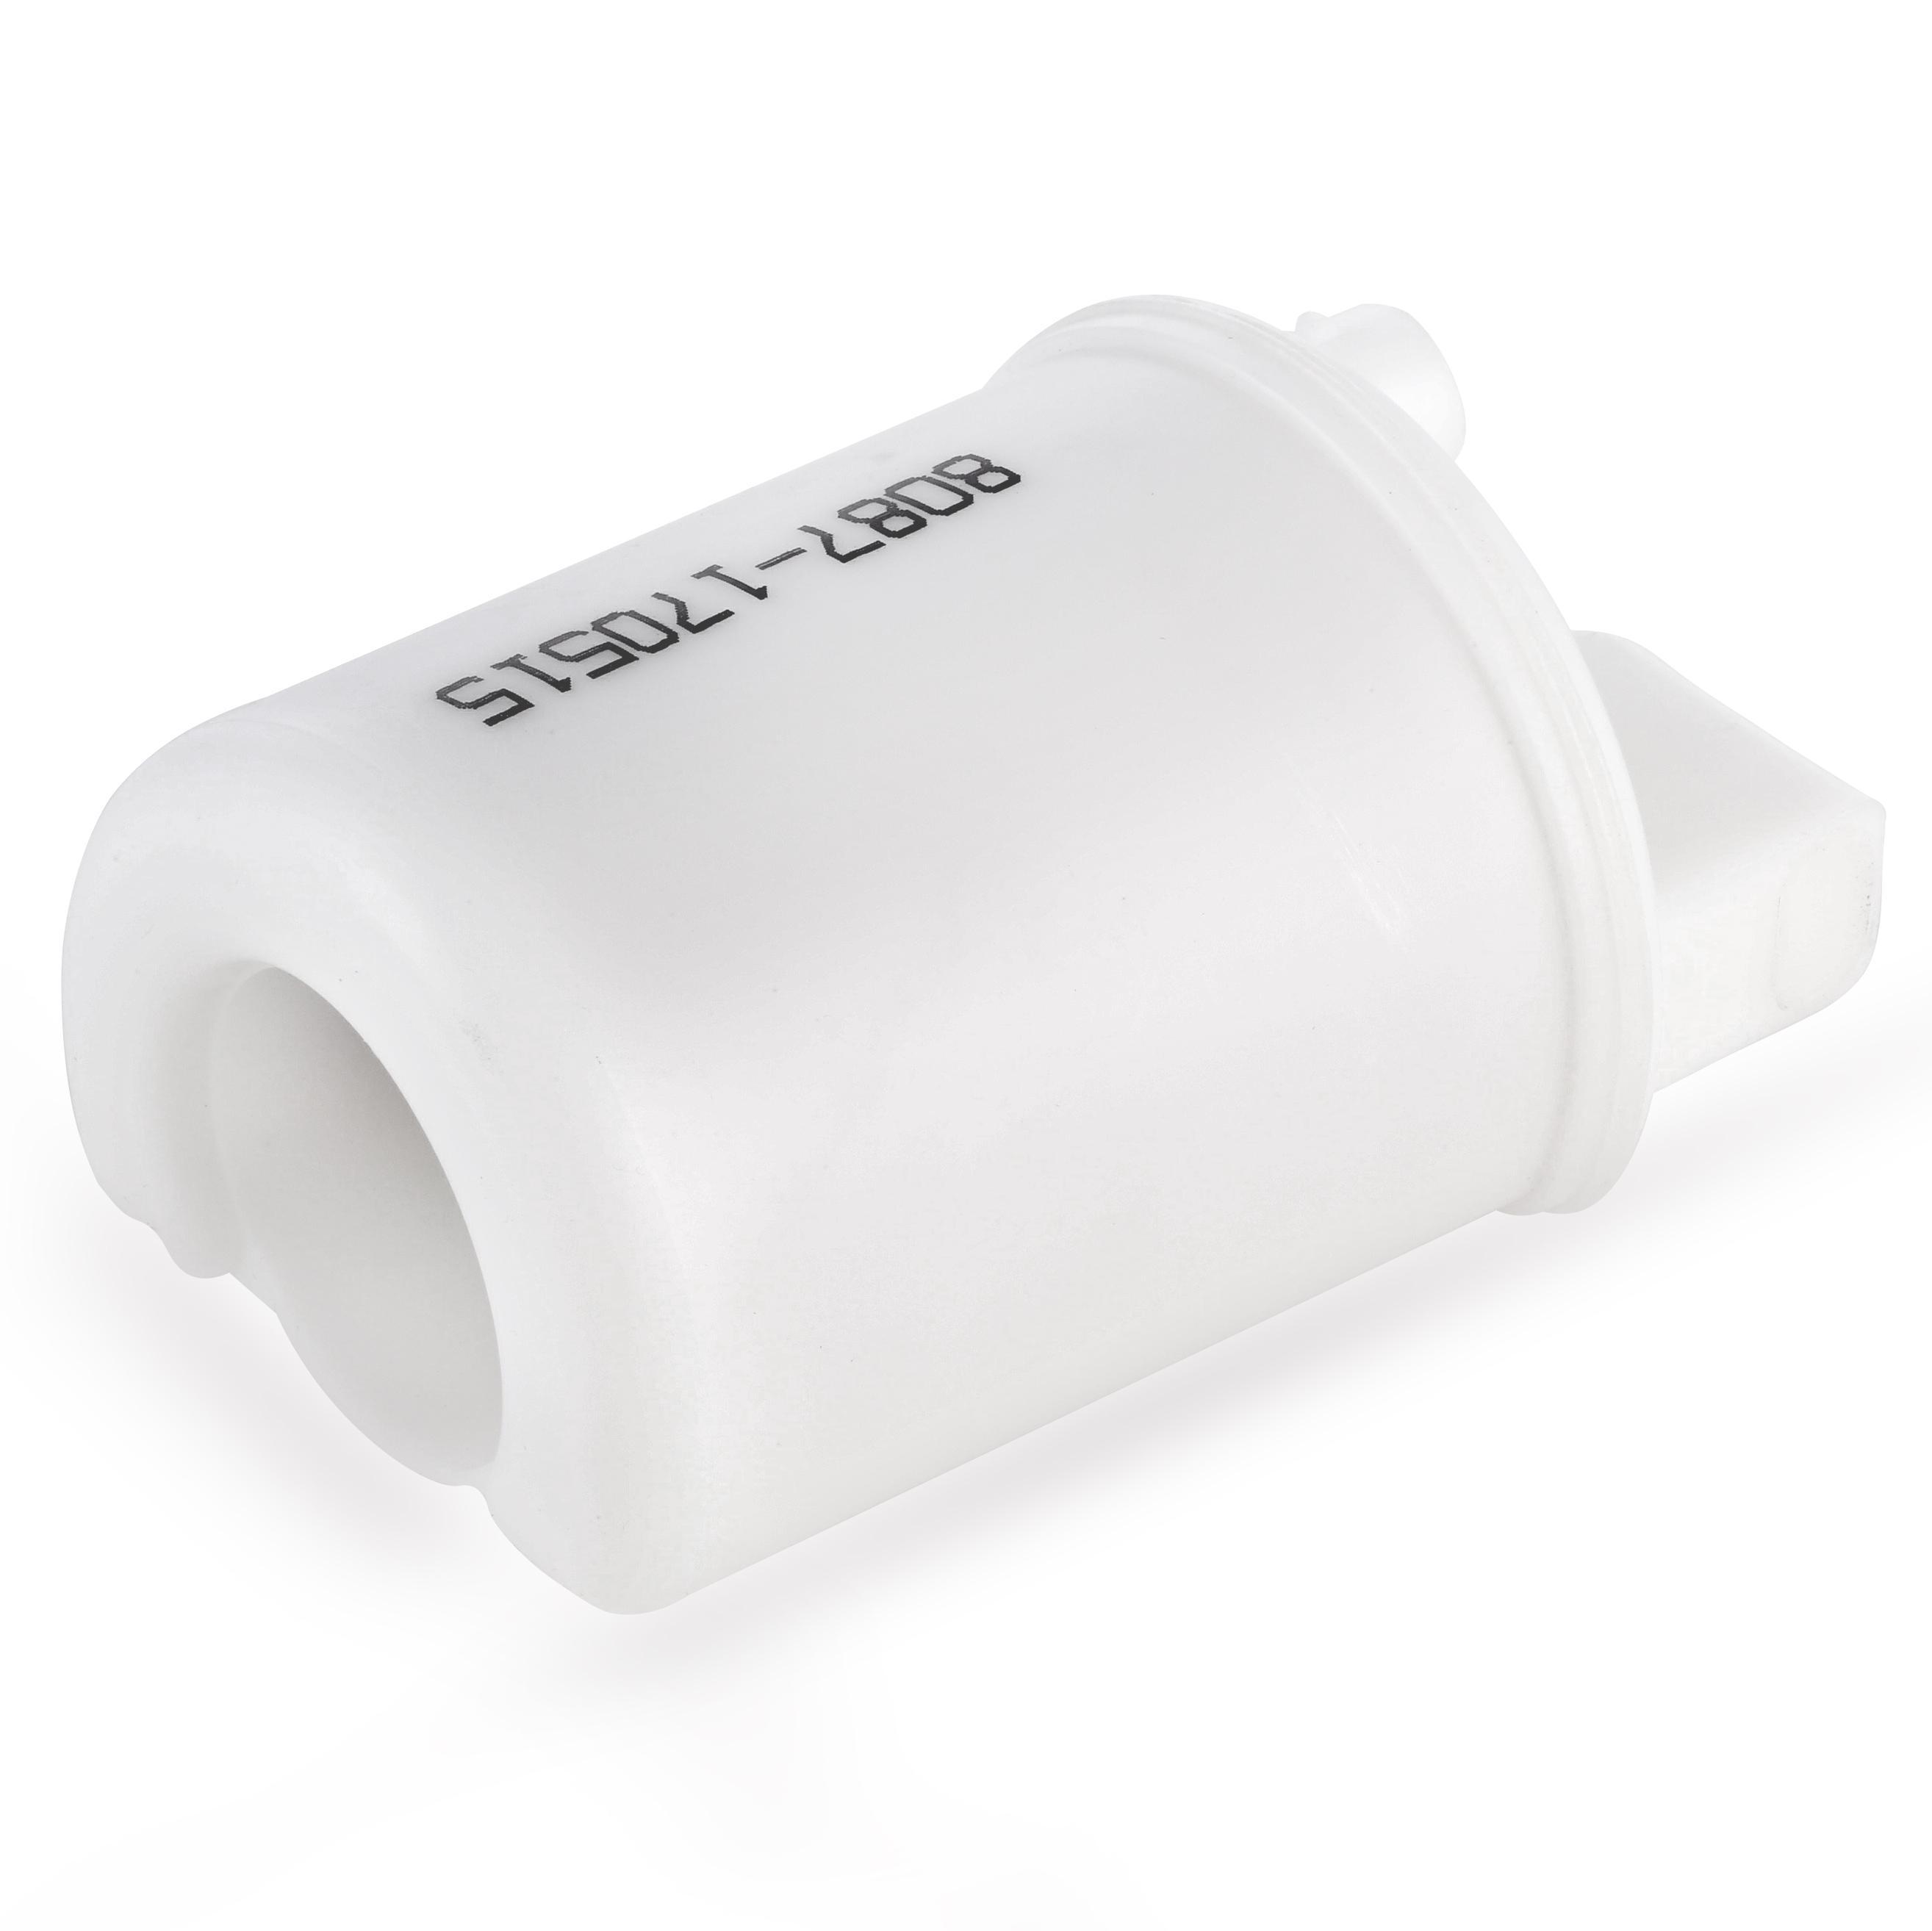 Inline fuel filter 9F0024 RIDEX 9F0024 original quality